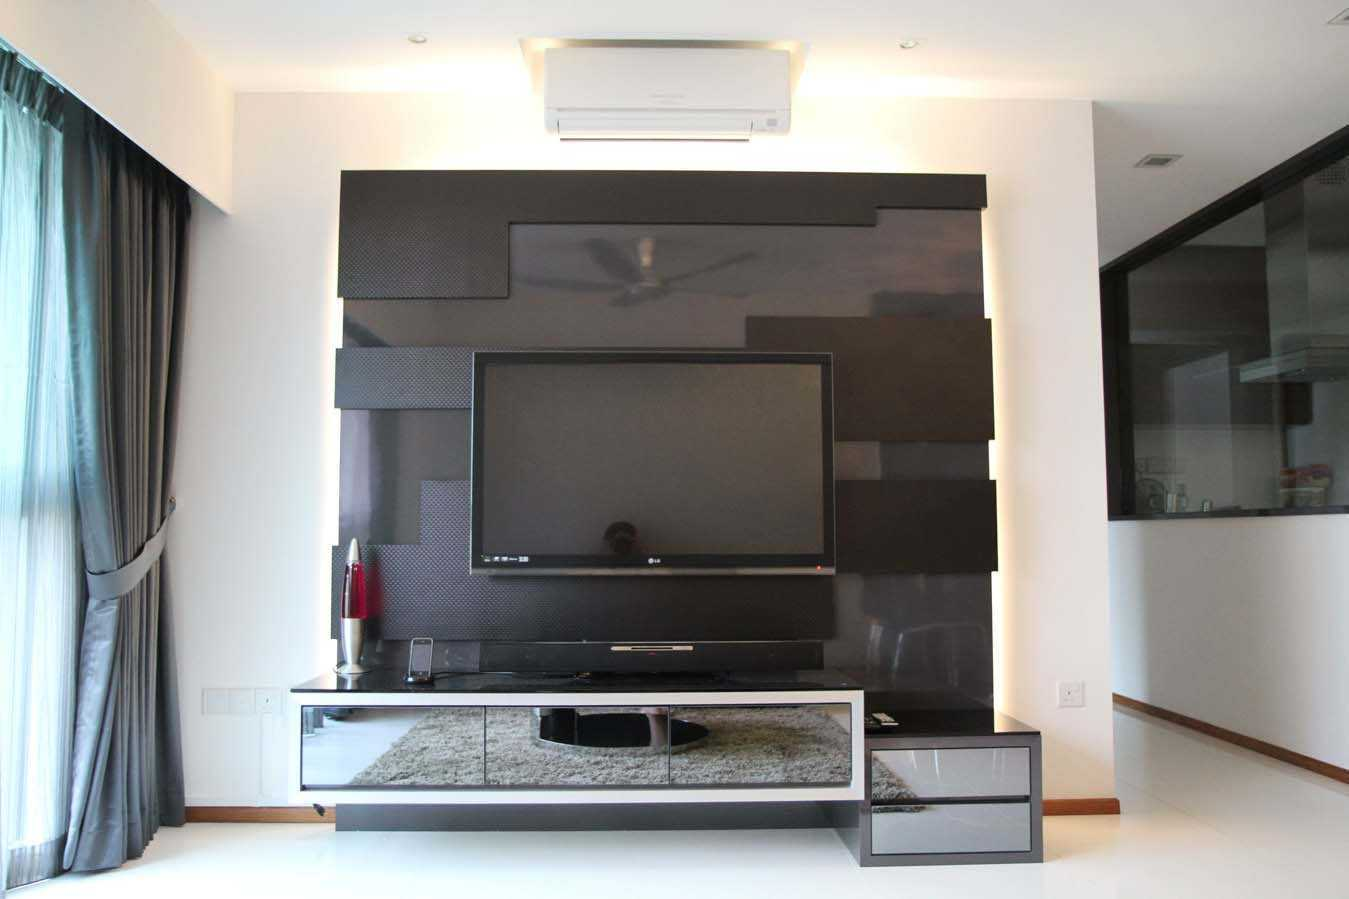 tv unit design ideas photos photo - 4